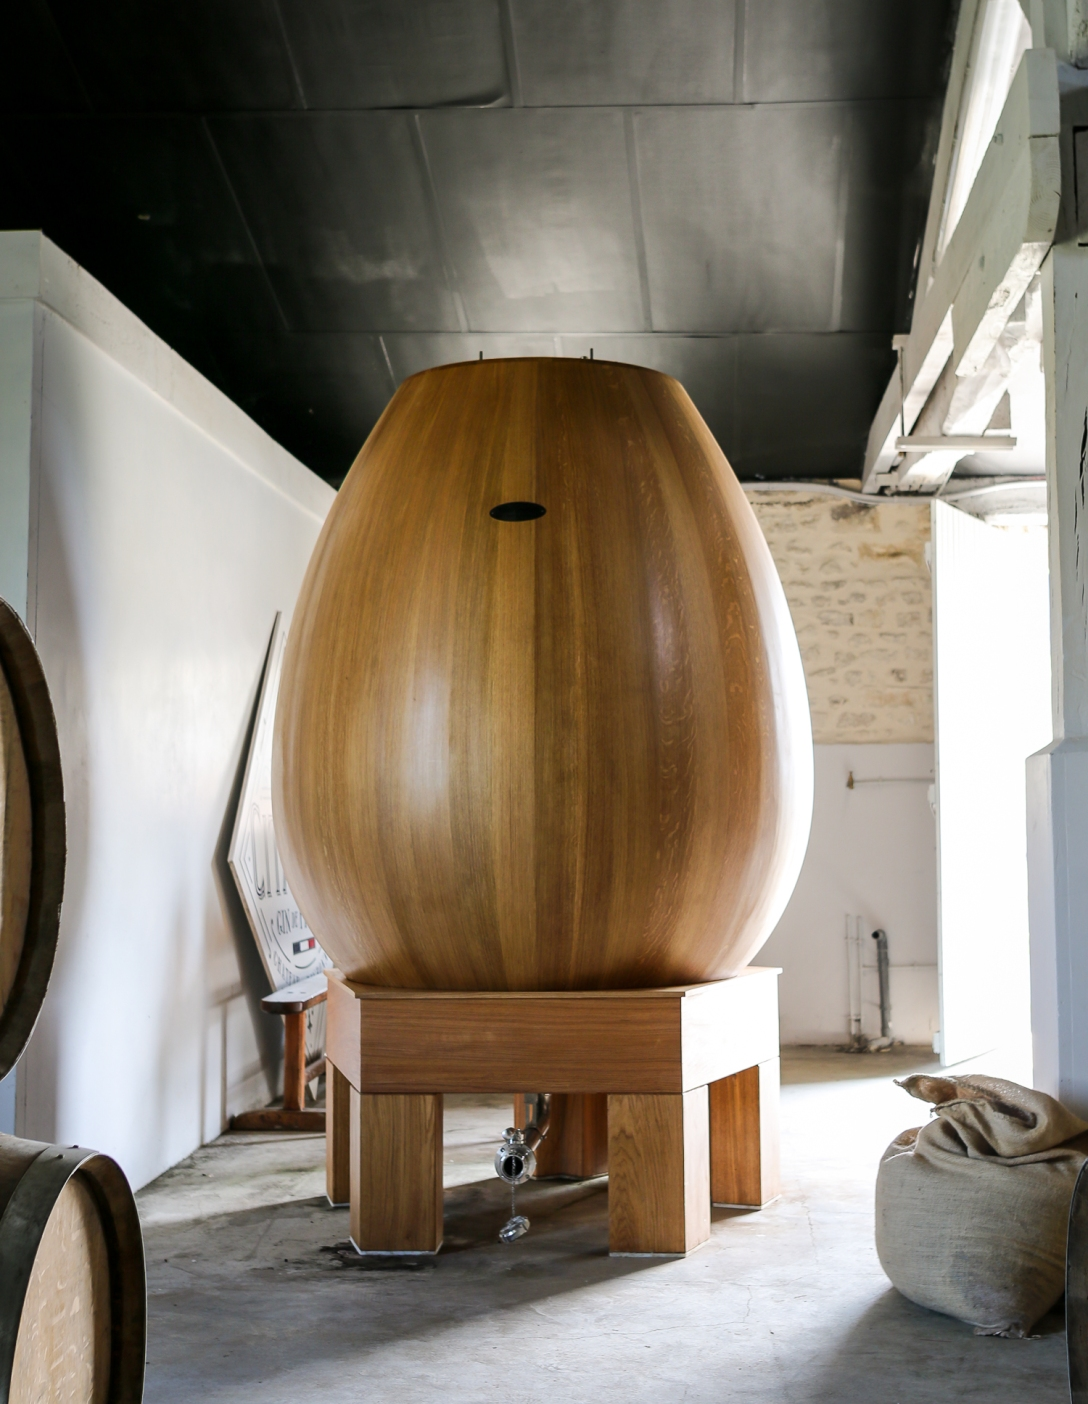 The Ovum til Citadelle Réserve Gin. Photo by Michael Sperling.